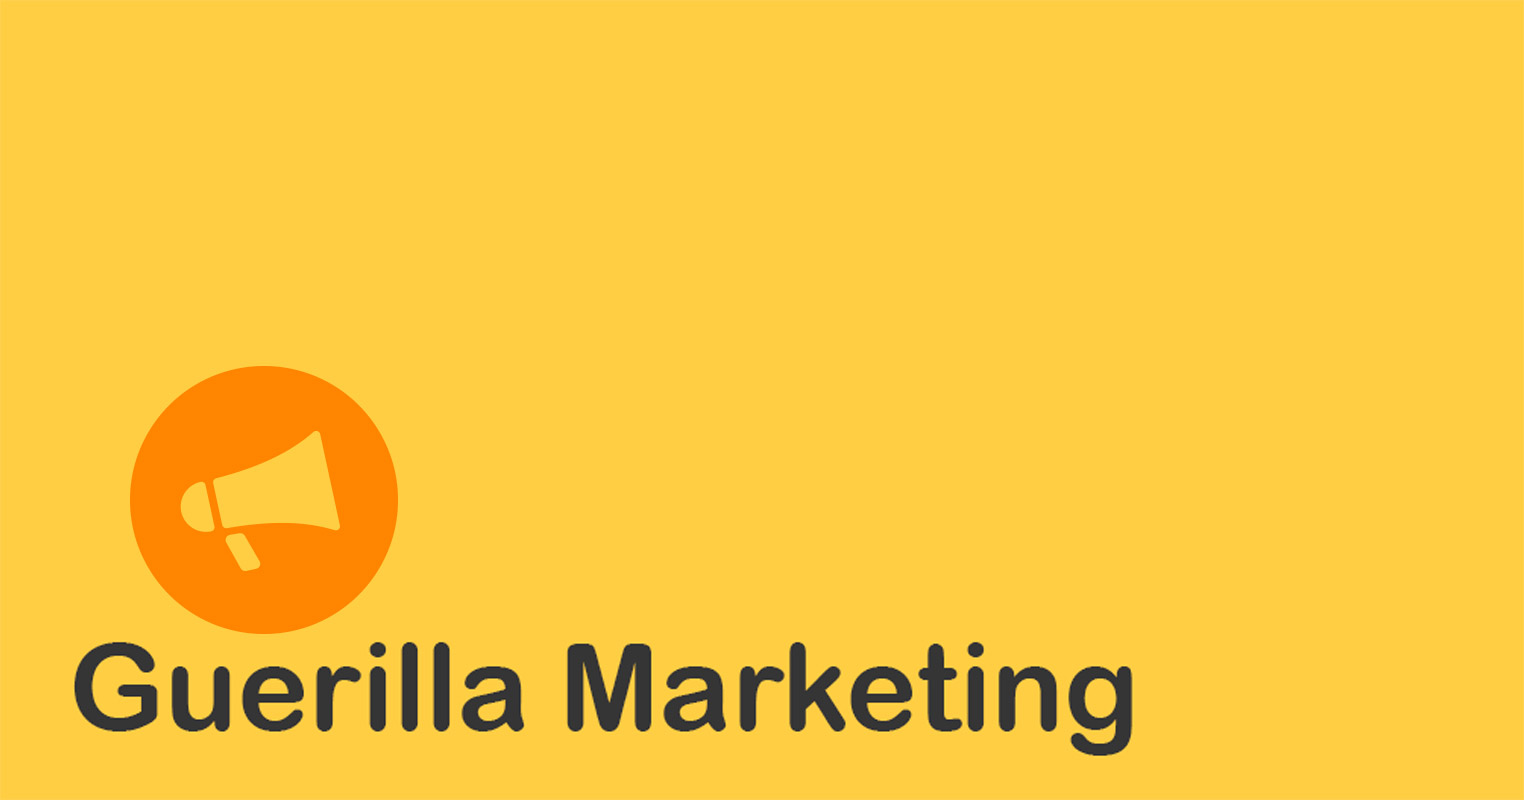 Guerrilla Marketing بازاریابی چریکی بازاریابی پارتیزانی